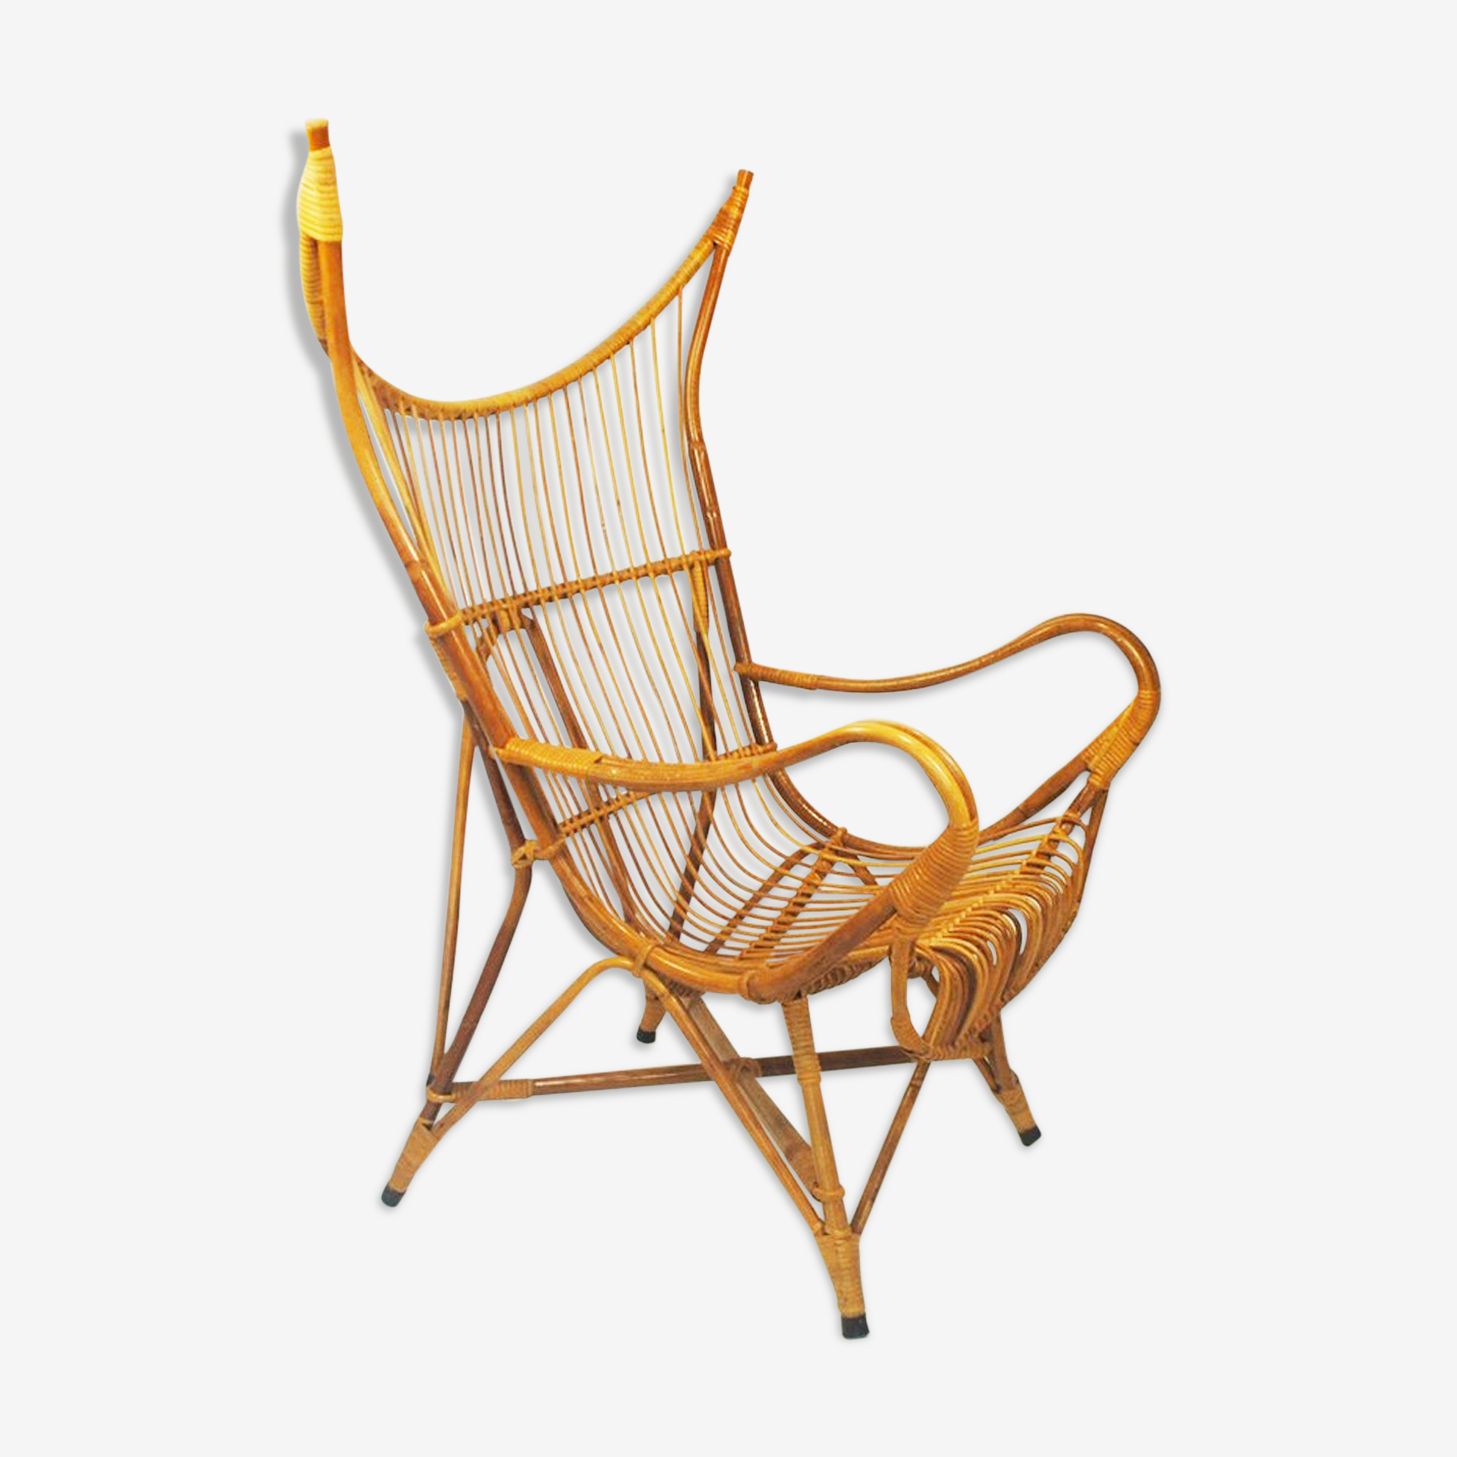 Armchair in rattan by Rohe Noordwolde